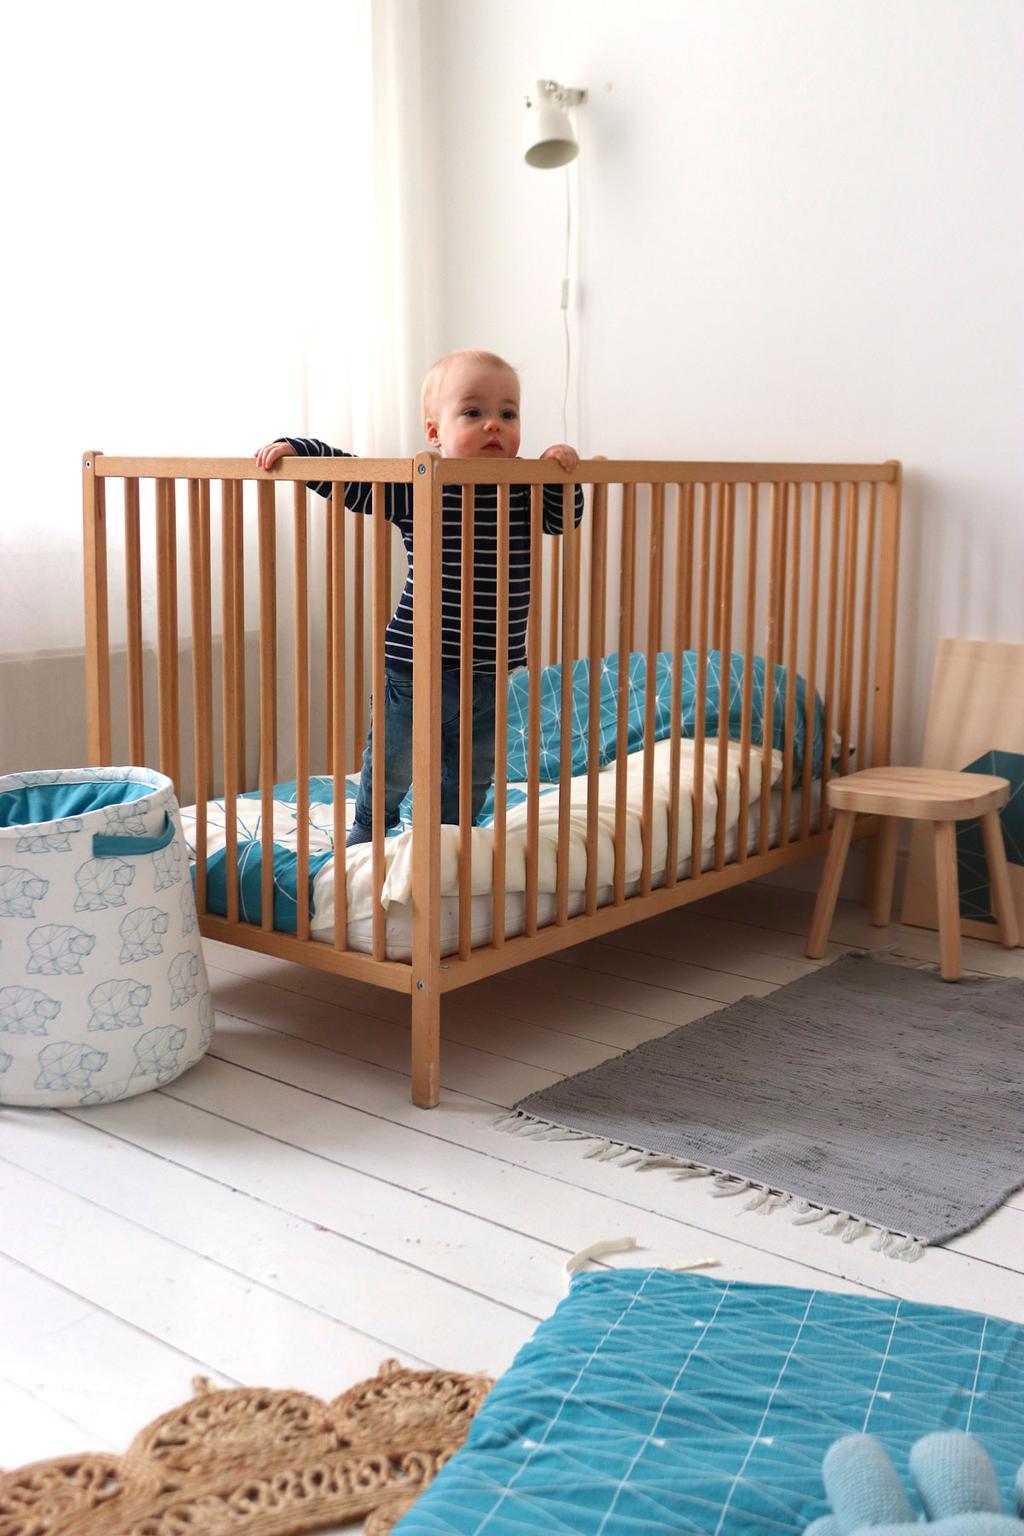 HYMY Baby - Desben Bedding